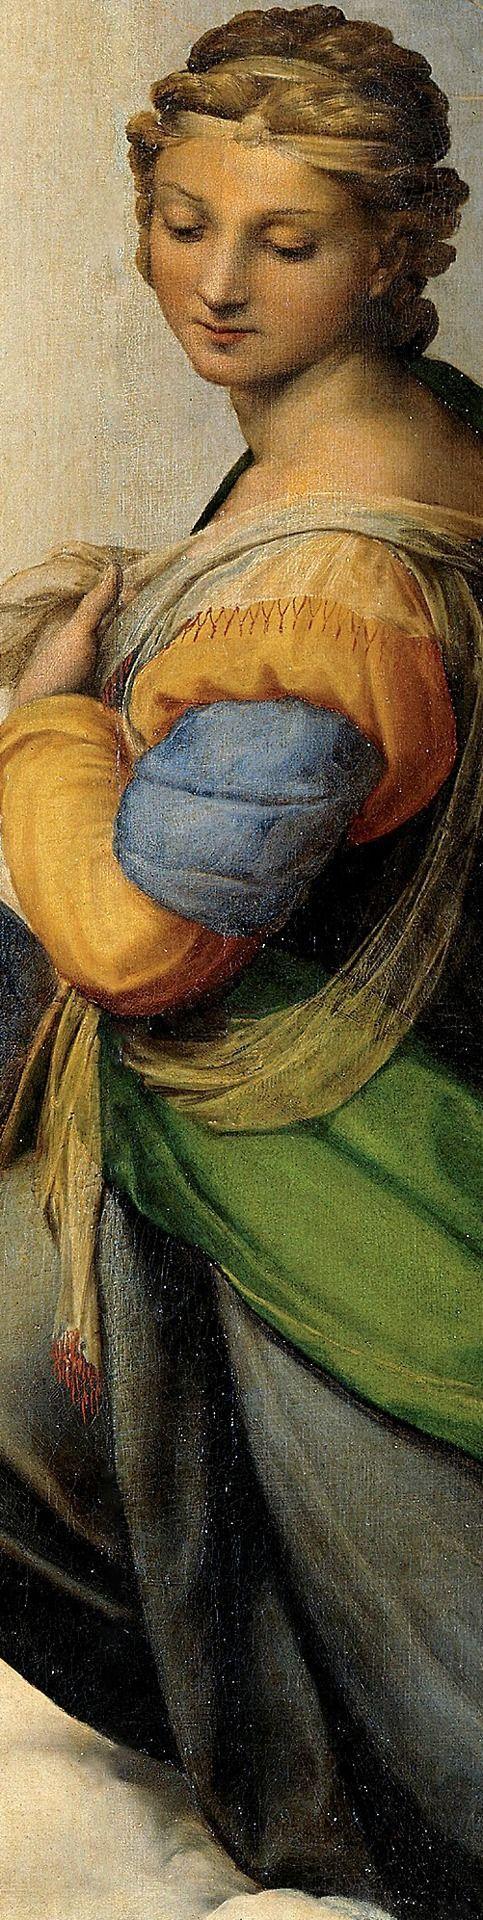 Detail from Sistine Madonna  --  1513-14  --  Raphael  --  Italian  --  Gemäldegalerie Alte Meister, Dresden